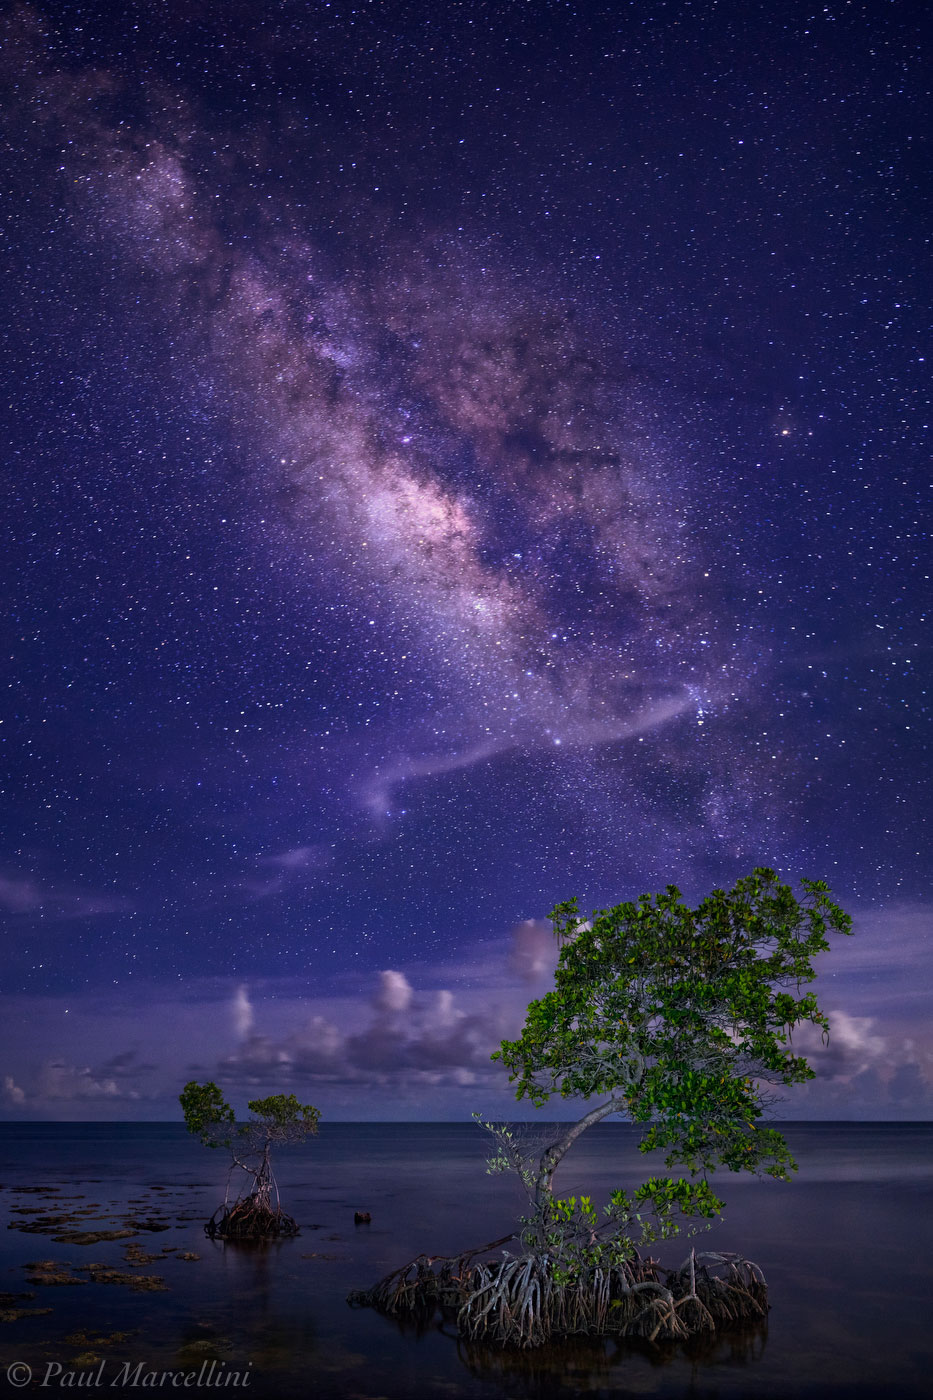 milky way, red mangrove, summer, florida keys, florida, nature, photography, photo